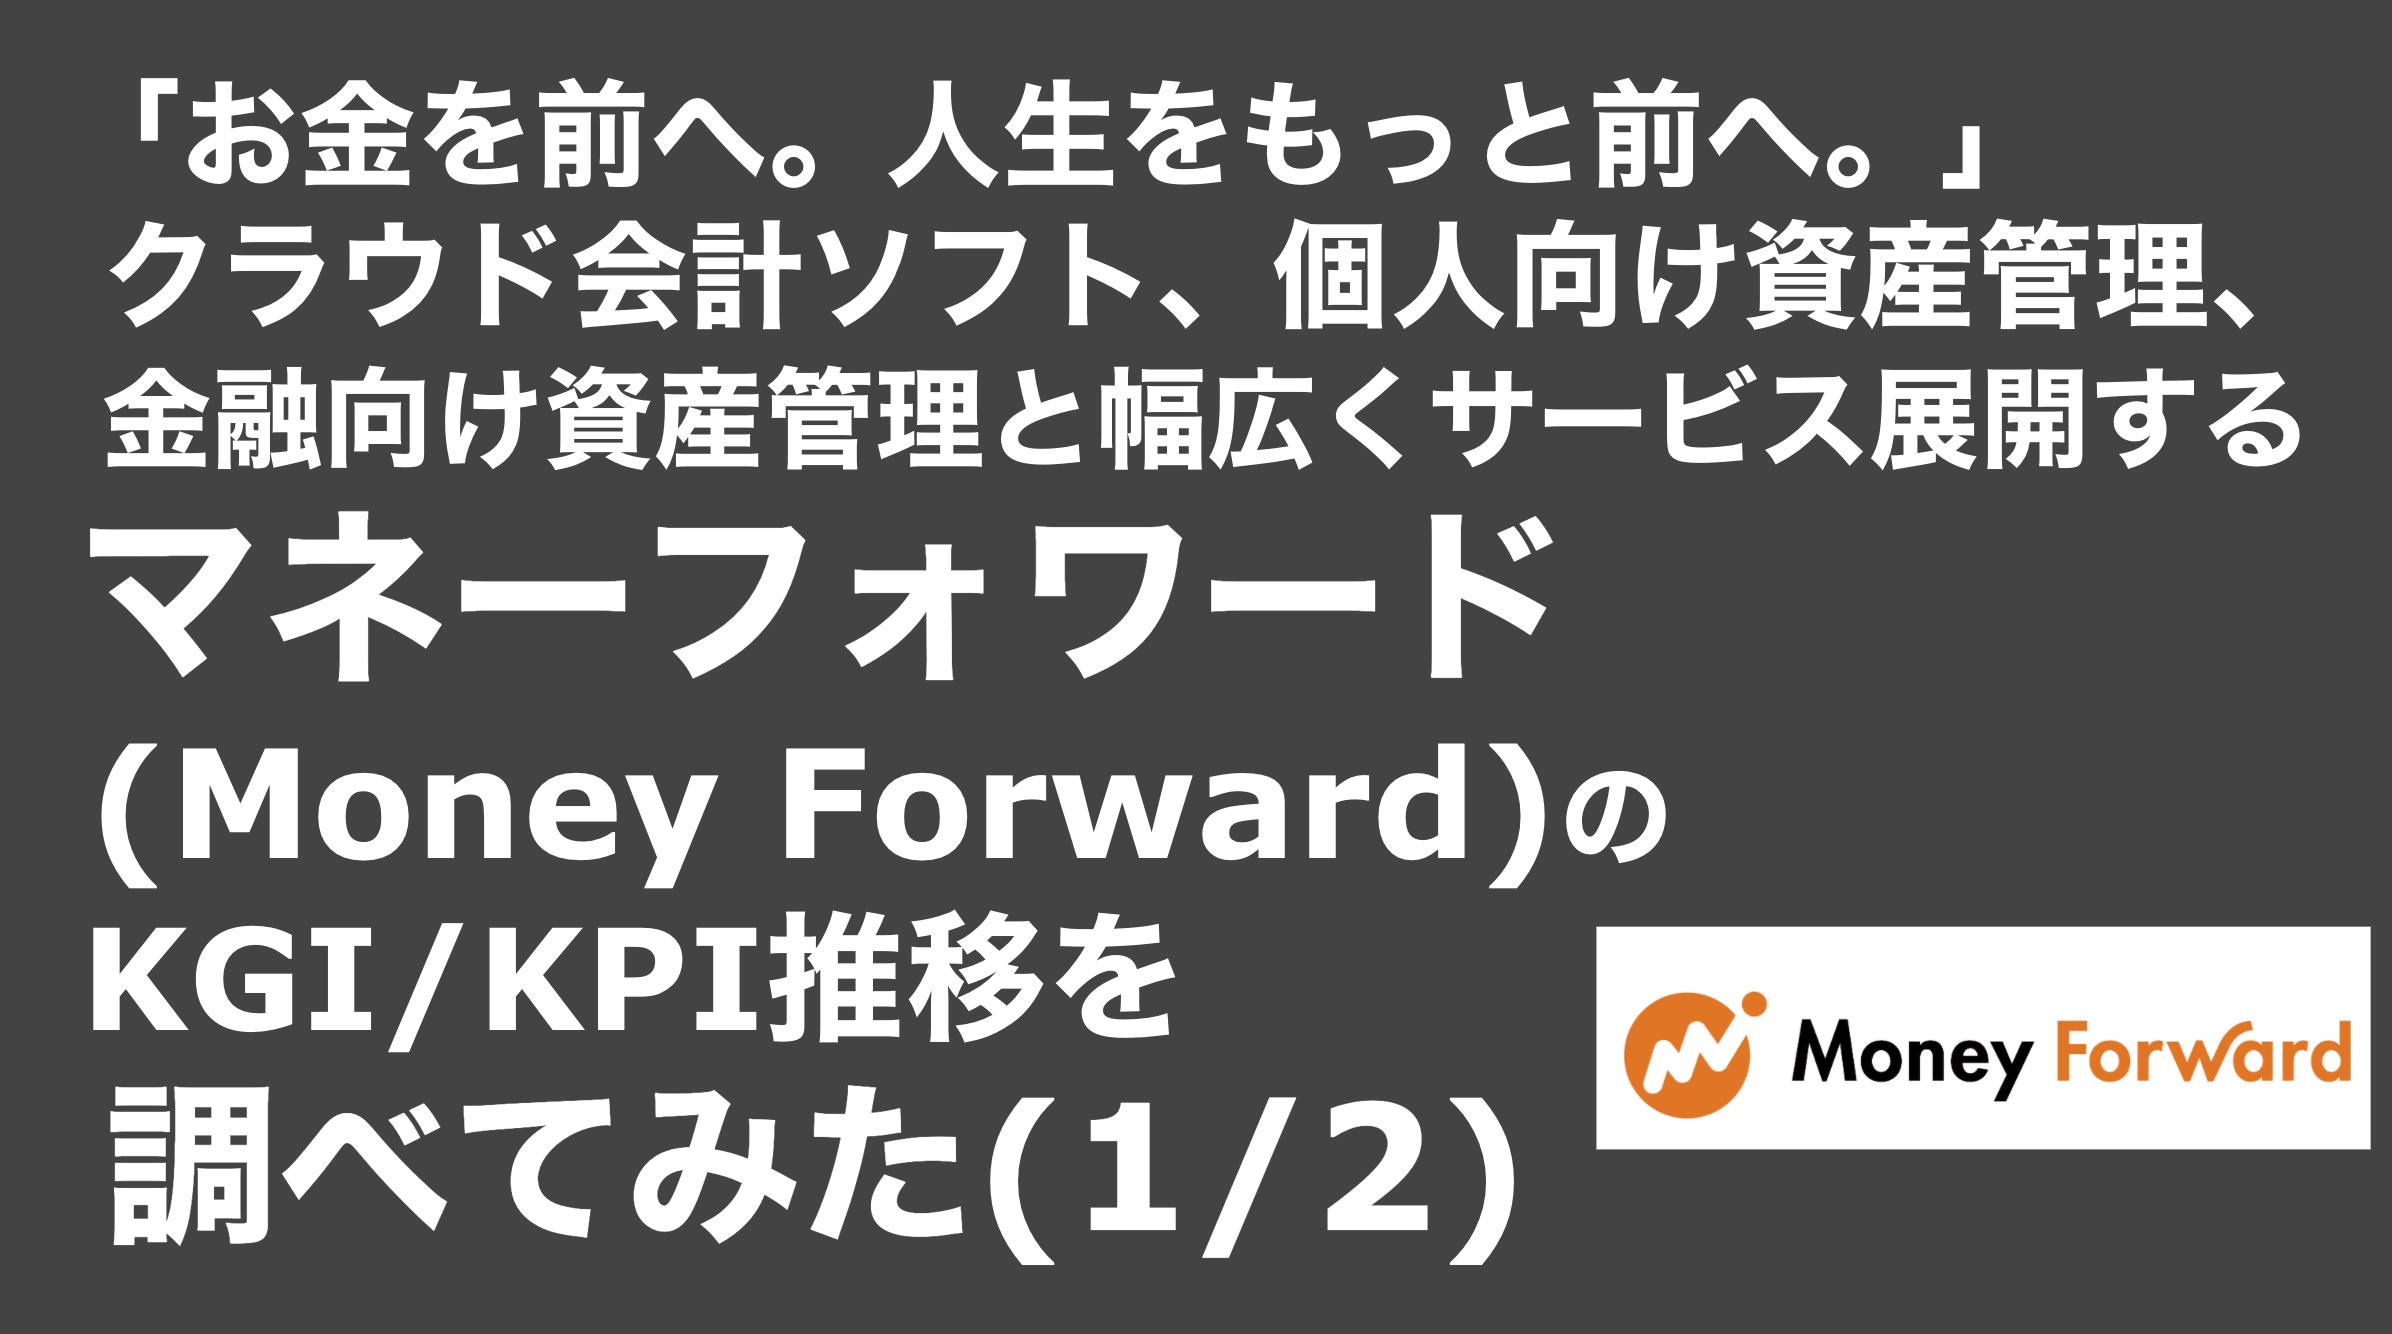 saaslife_「お金を前へ。人生をもっと前へ。」クラウド会計ソフト、個人向け資産管理、金融向け資産管理と幅広くサービス展開するマネーフォワード(Money Forward)のKGI/KPI推移を調べてみた(1/2)